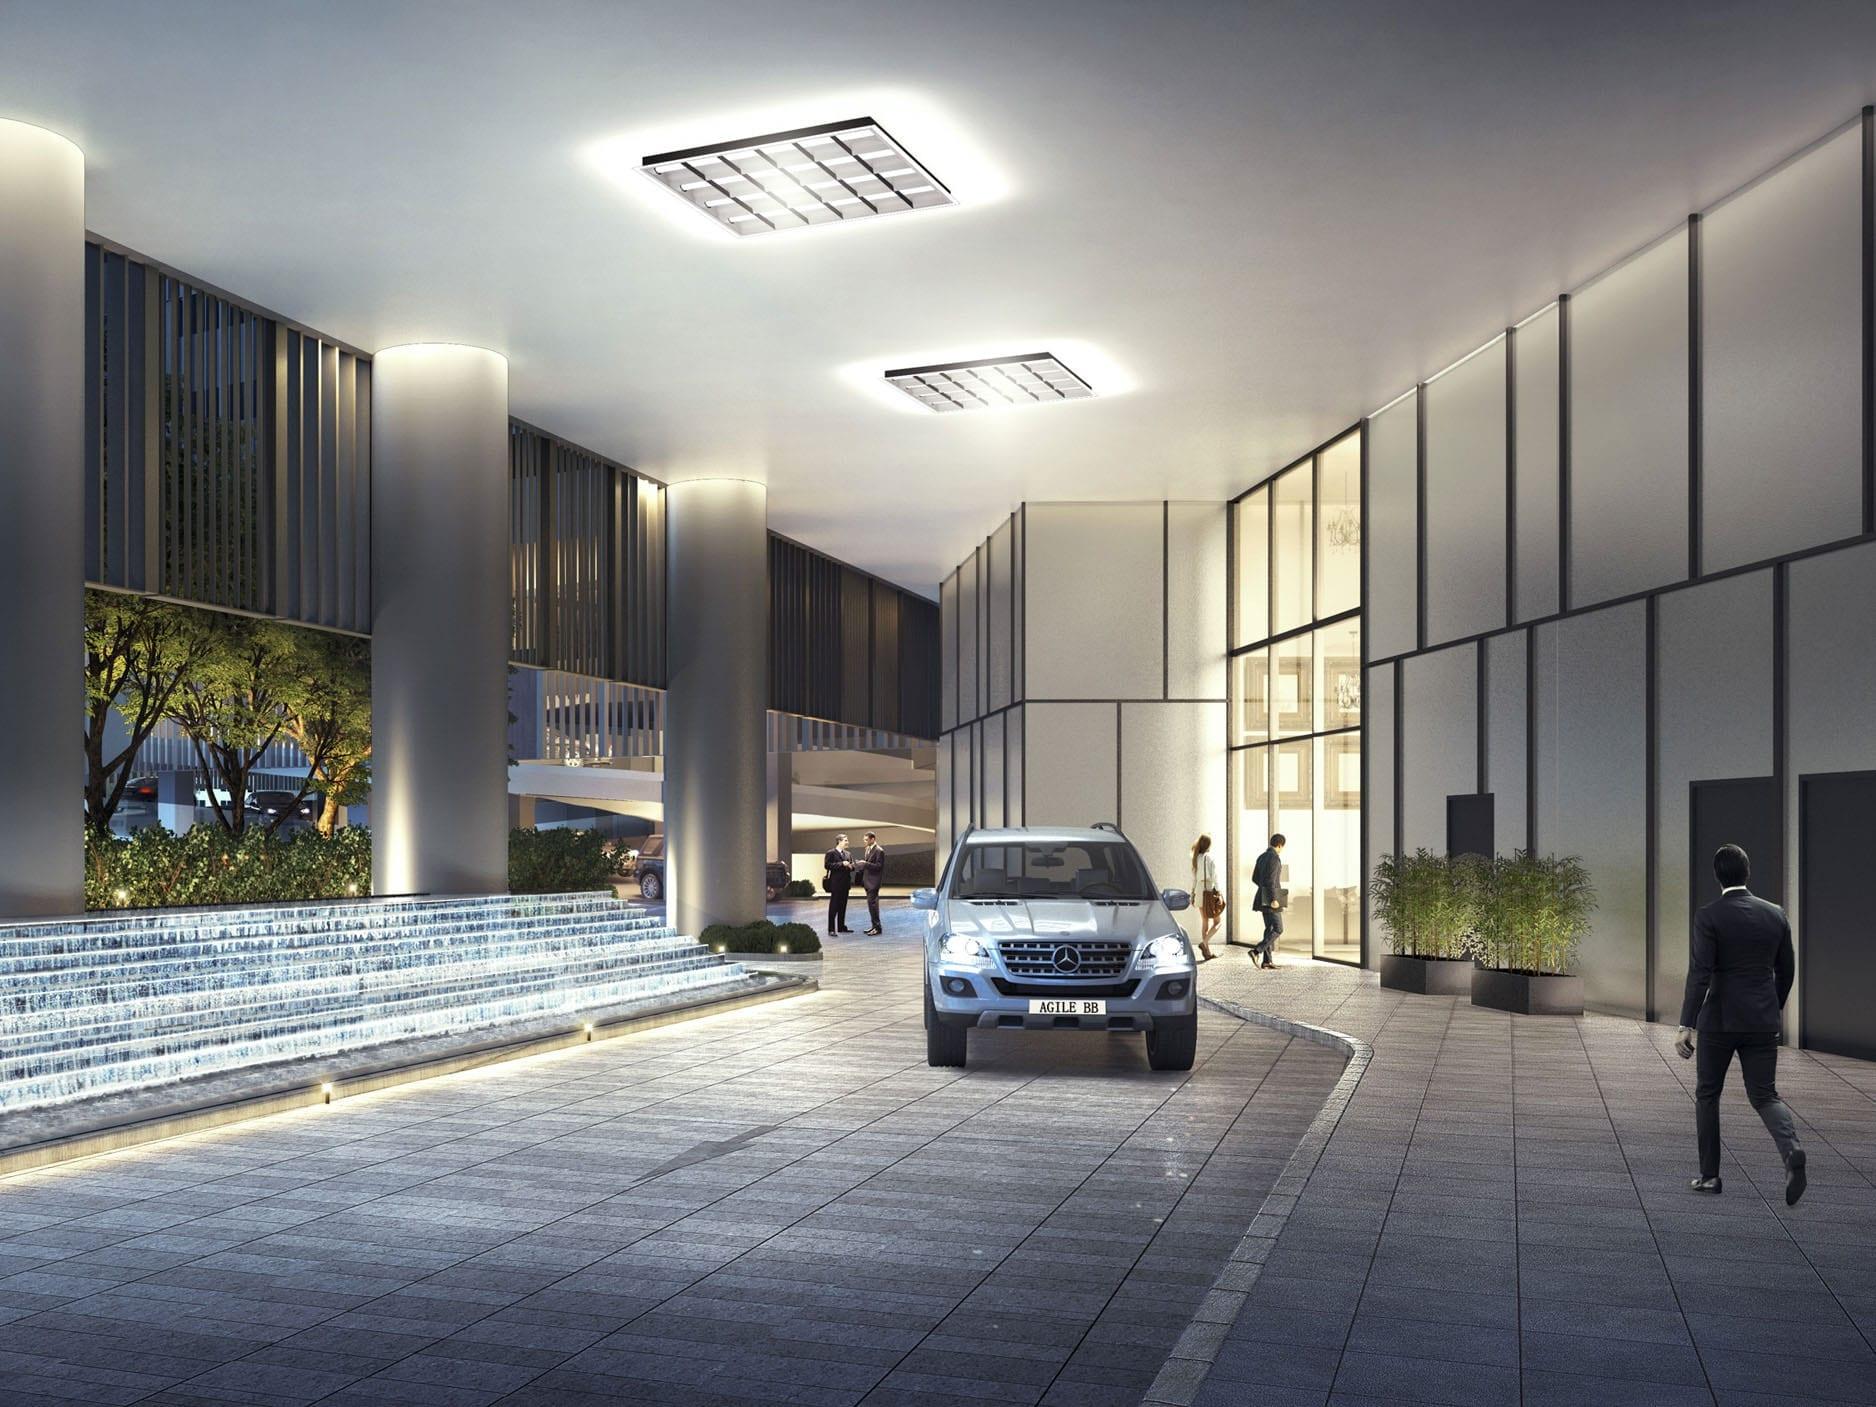 Agile Bukit Bintang Image 05